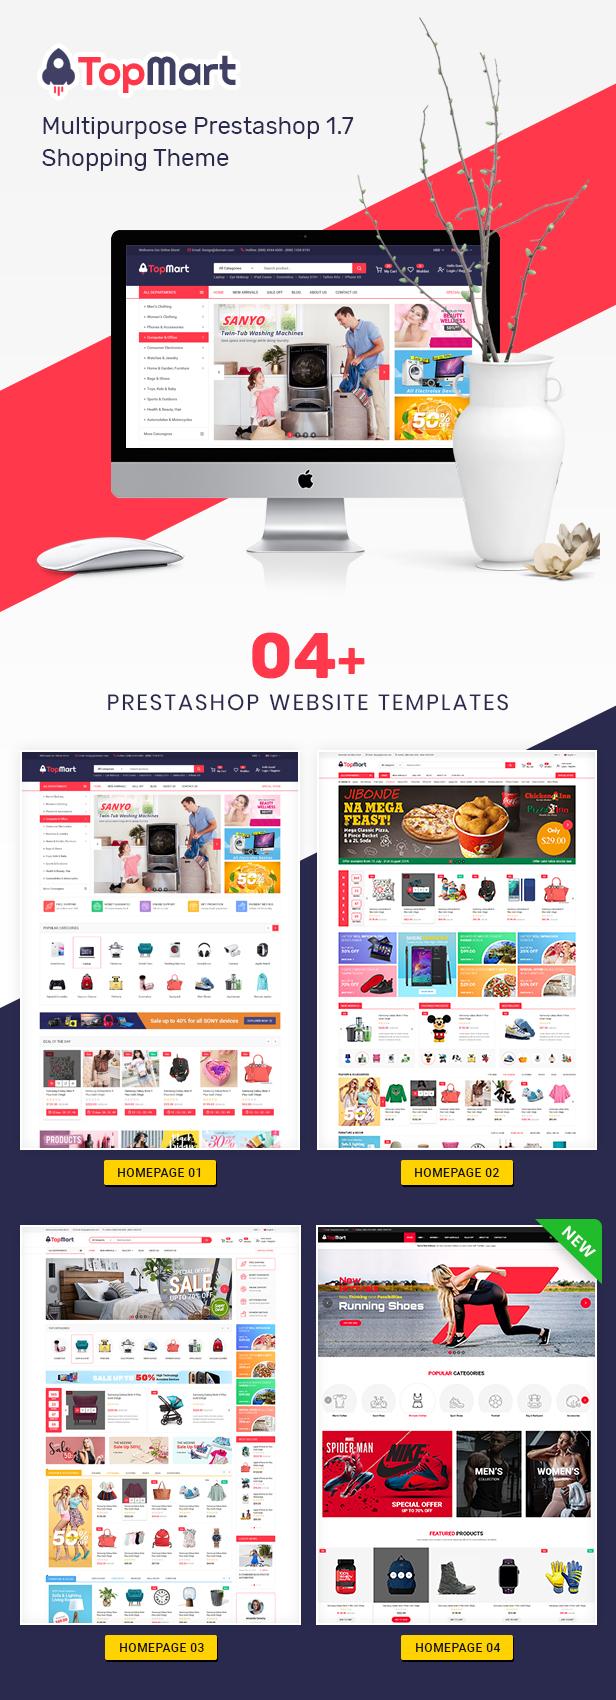 TopMart - MultiPurpose Responsive PrestaShop Theme - 1